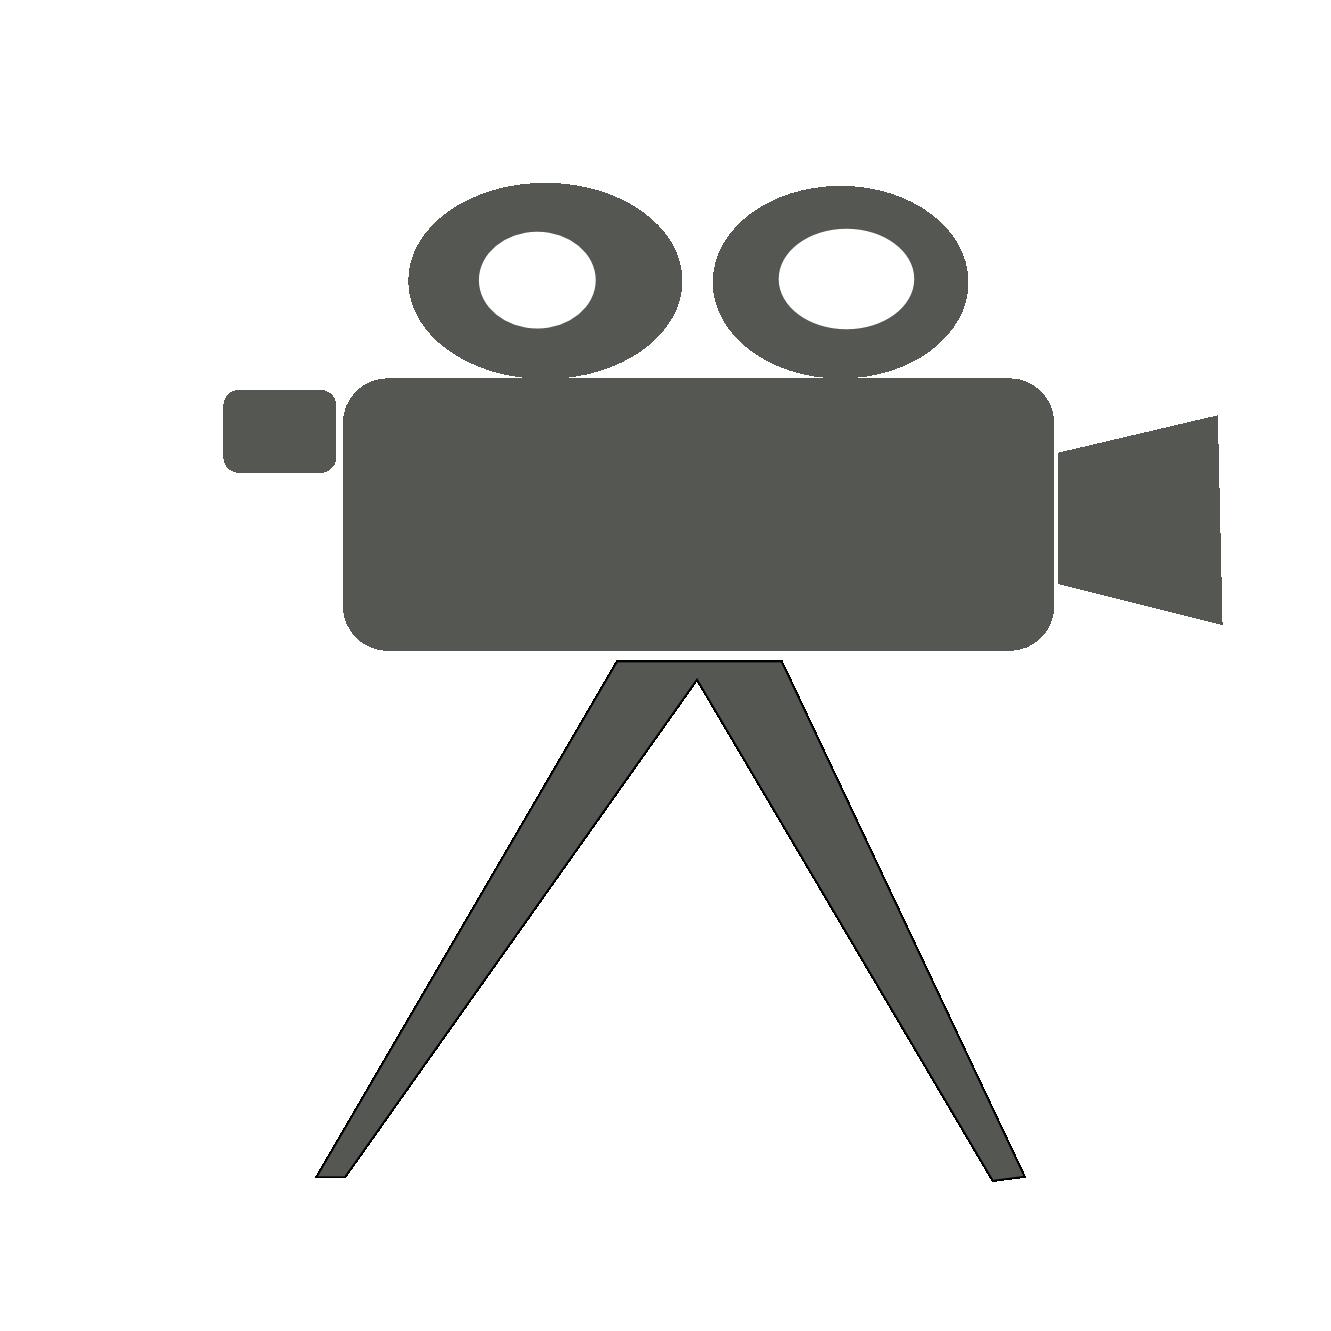 Free Video Camera Clipart, Download Free Clip Art, Free Clip.